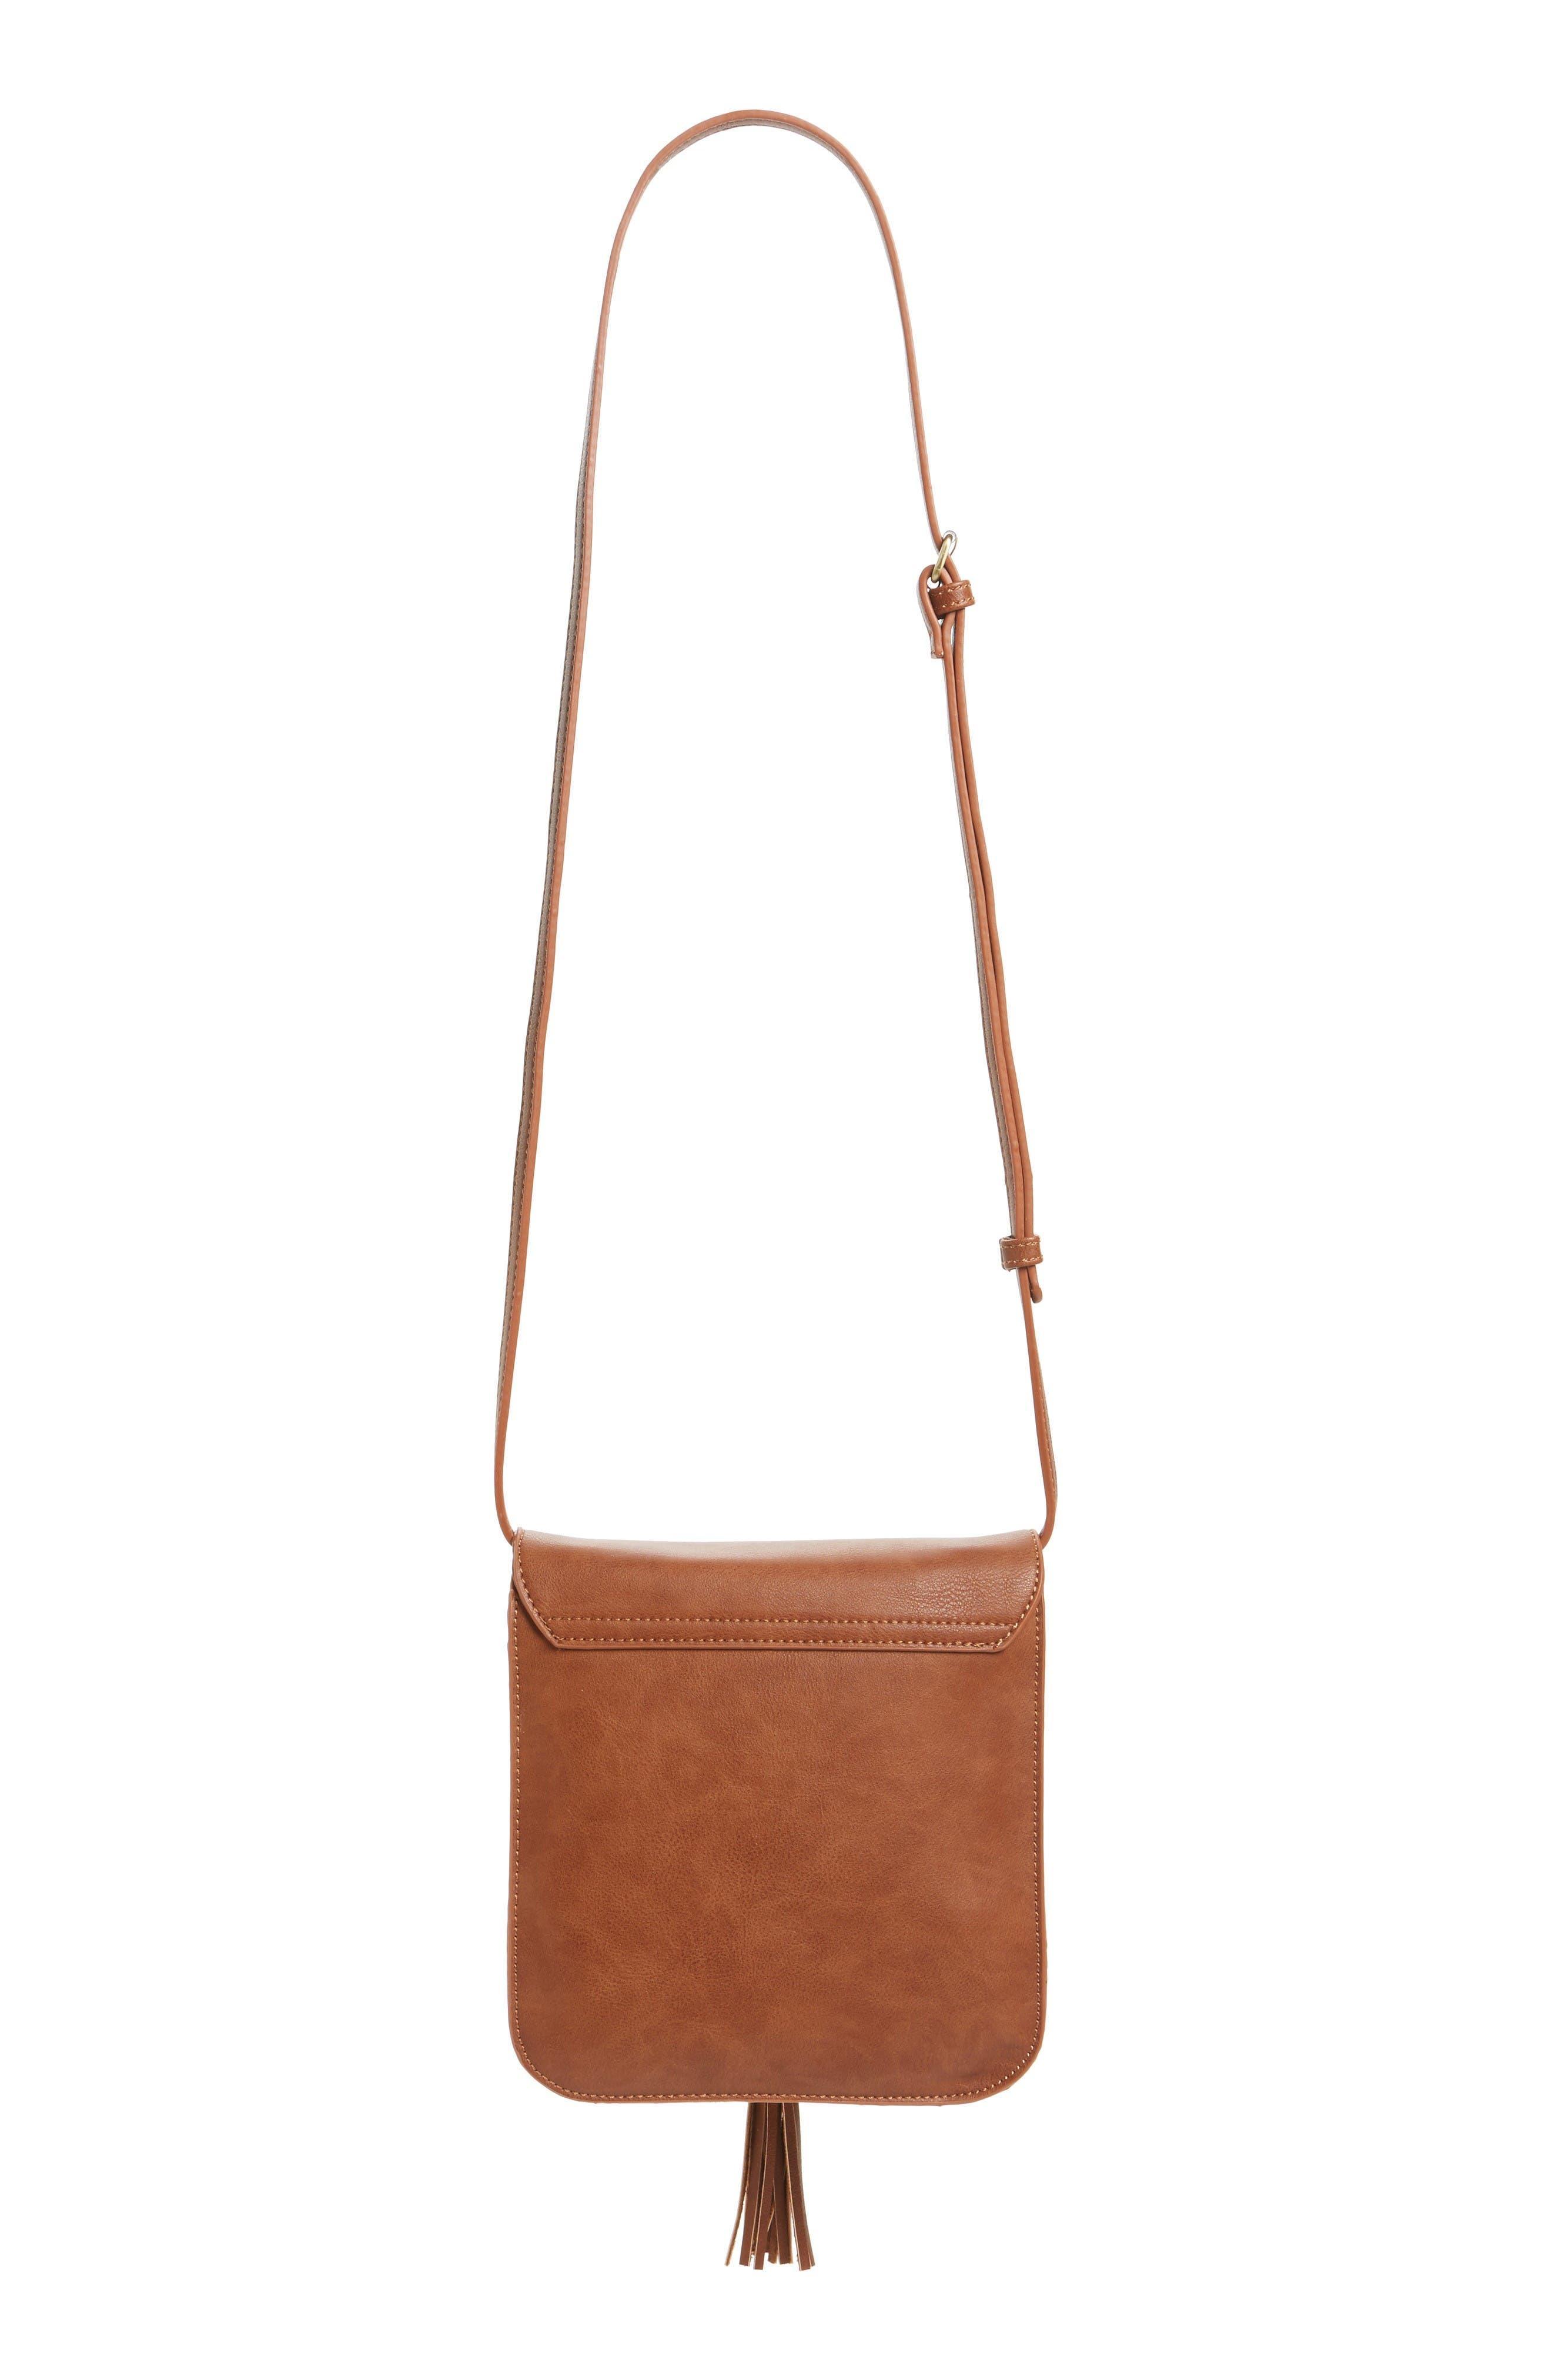 Alternate Image 3  - Sole Society Square Crossbody Bag